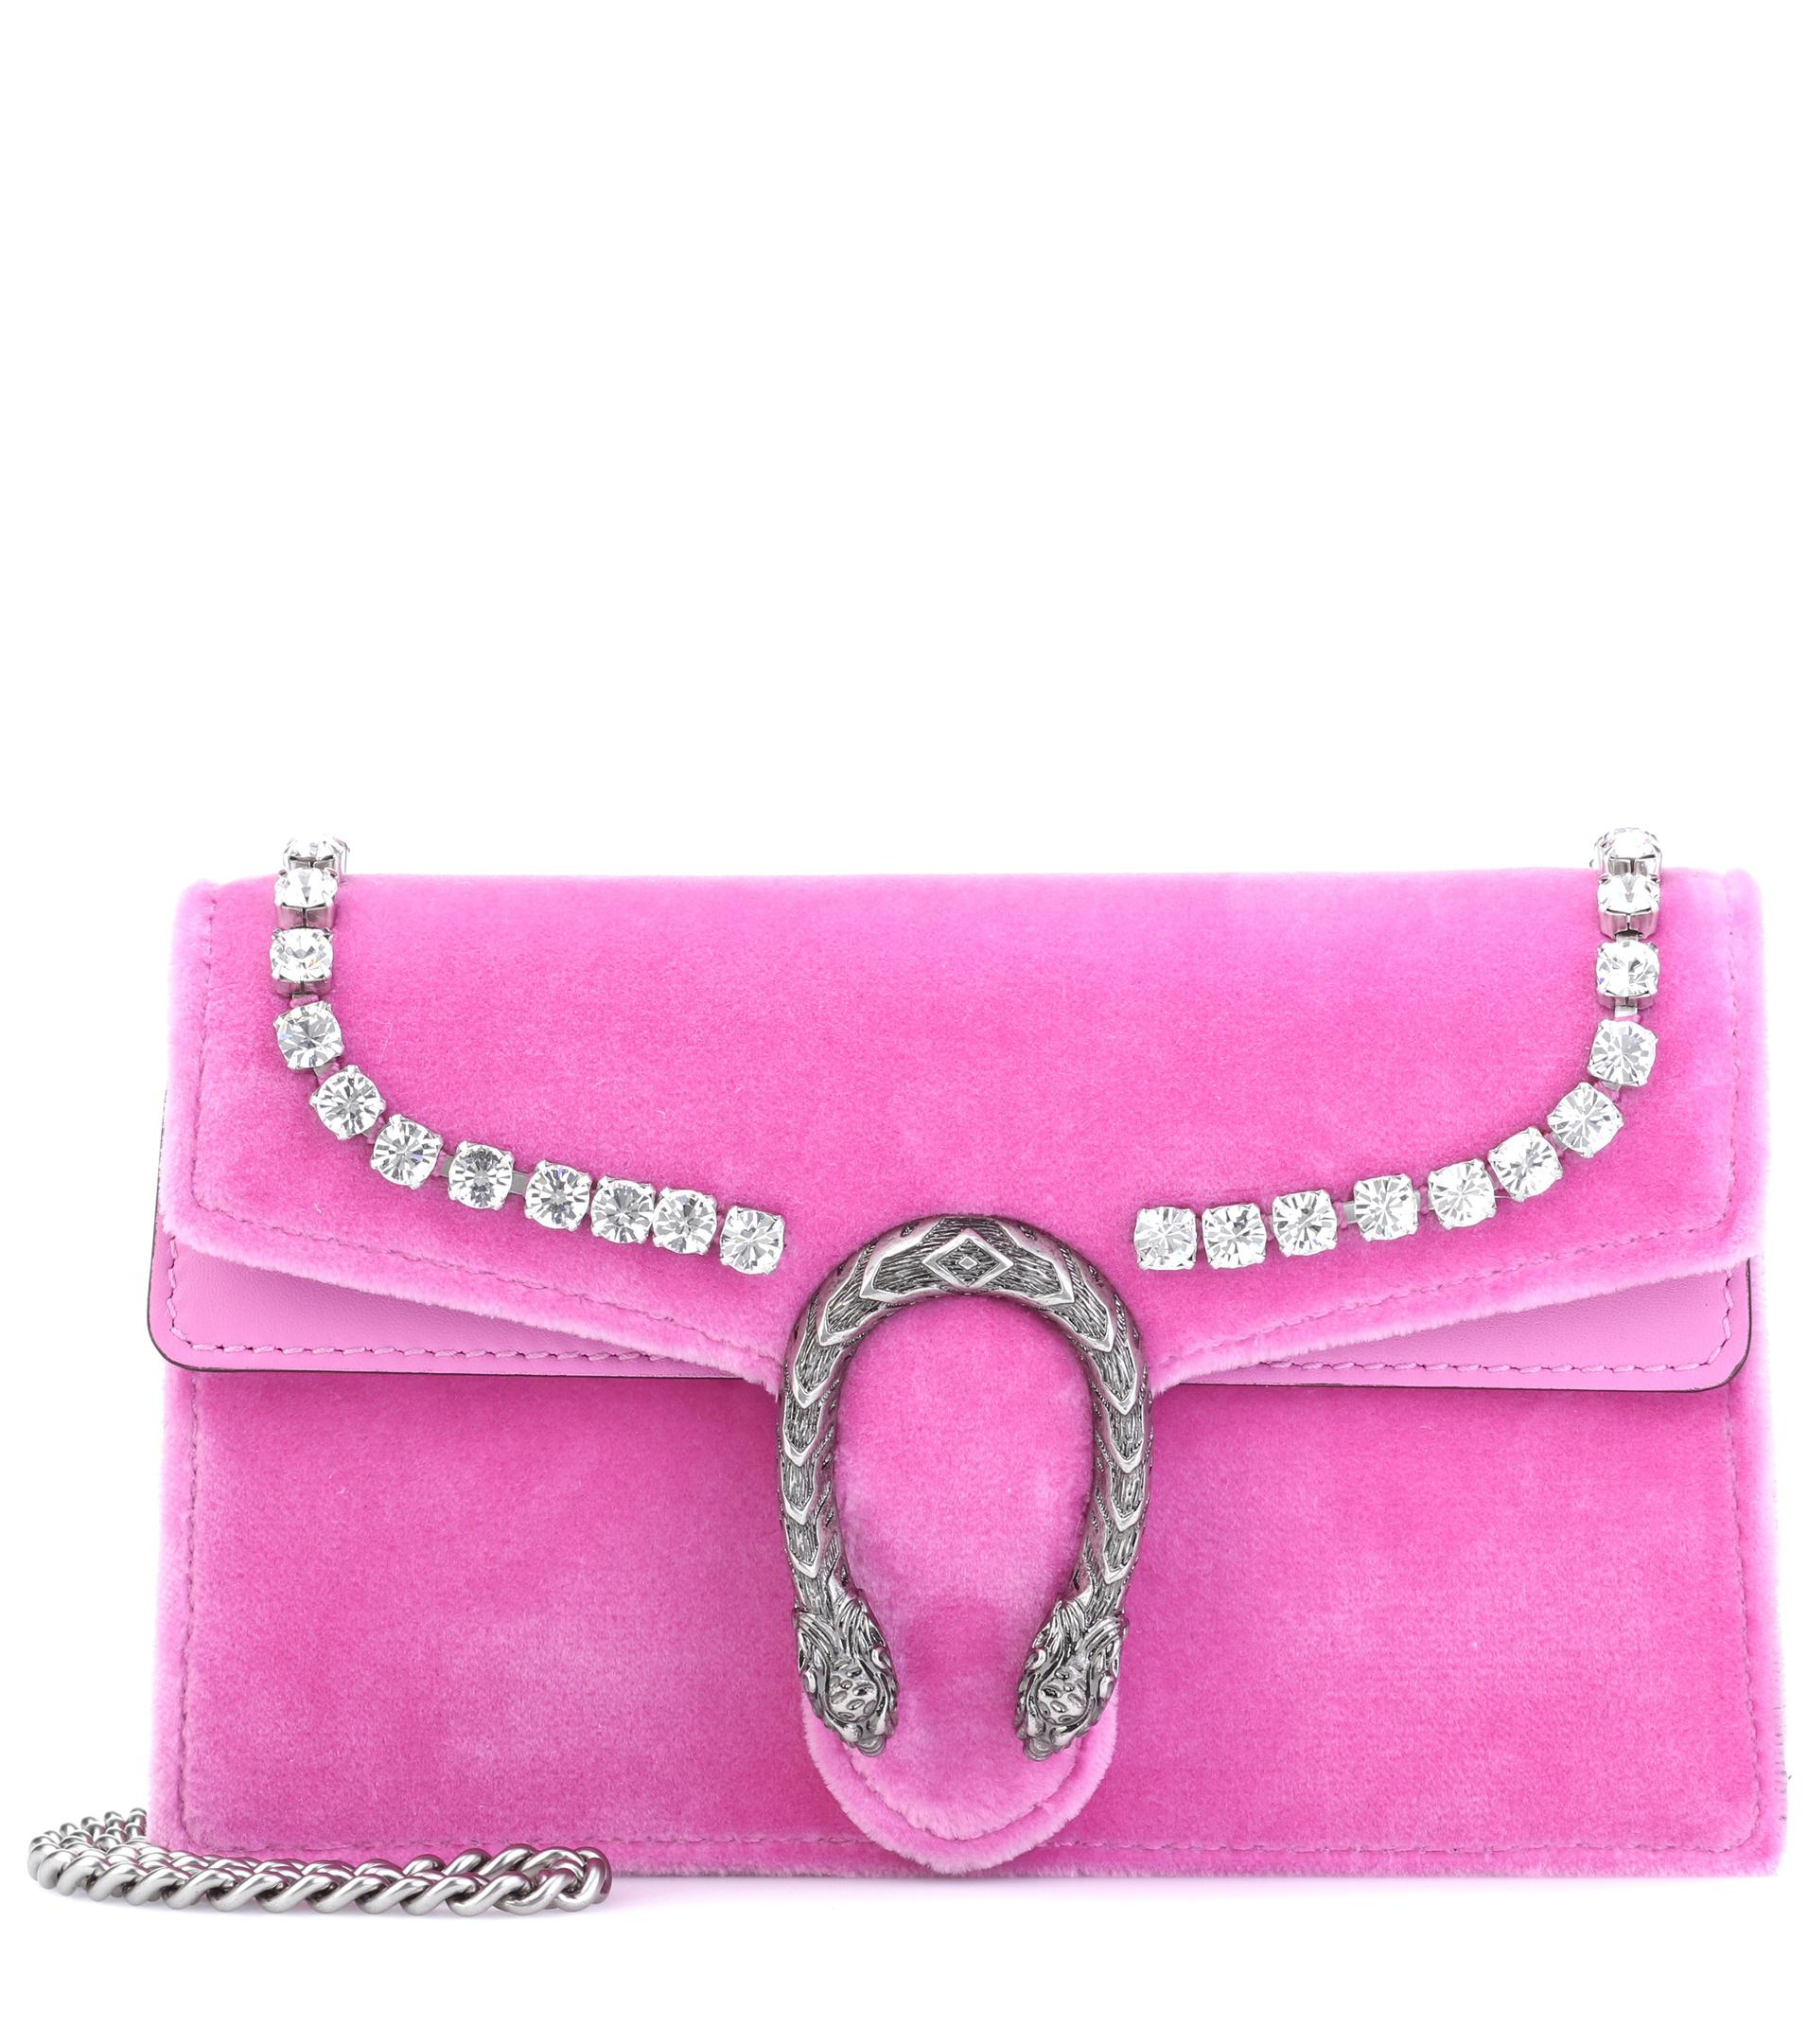 249b35ad0623 Gucci Dionysus Super Mini Shoulder Bag in Pink - Lyst